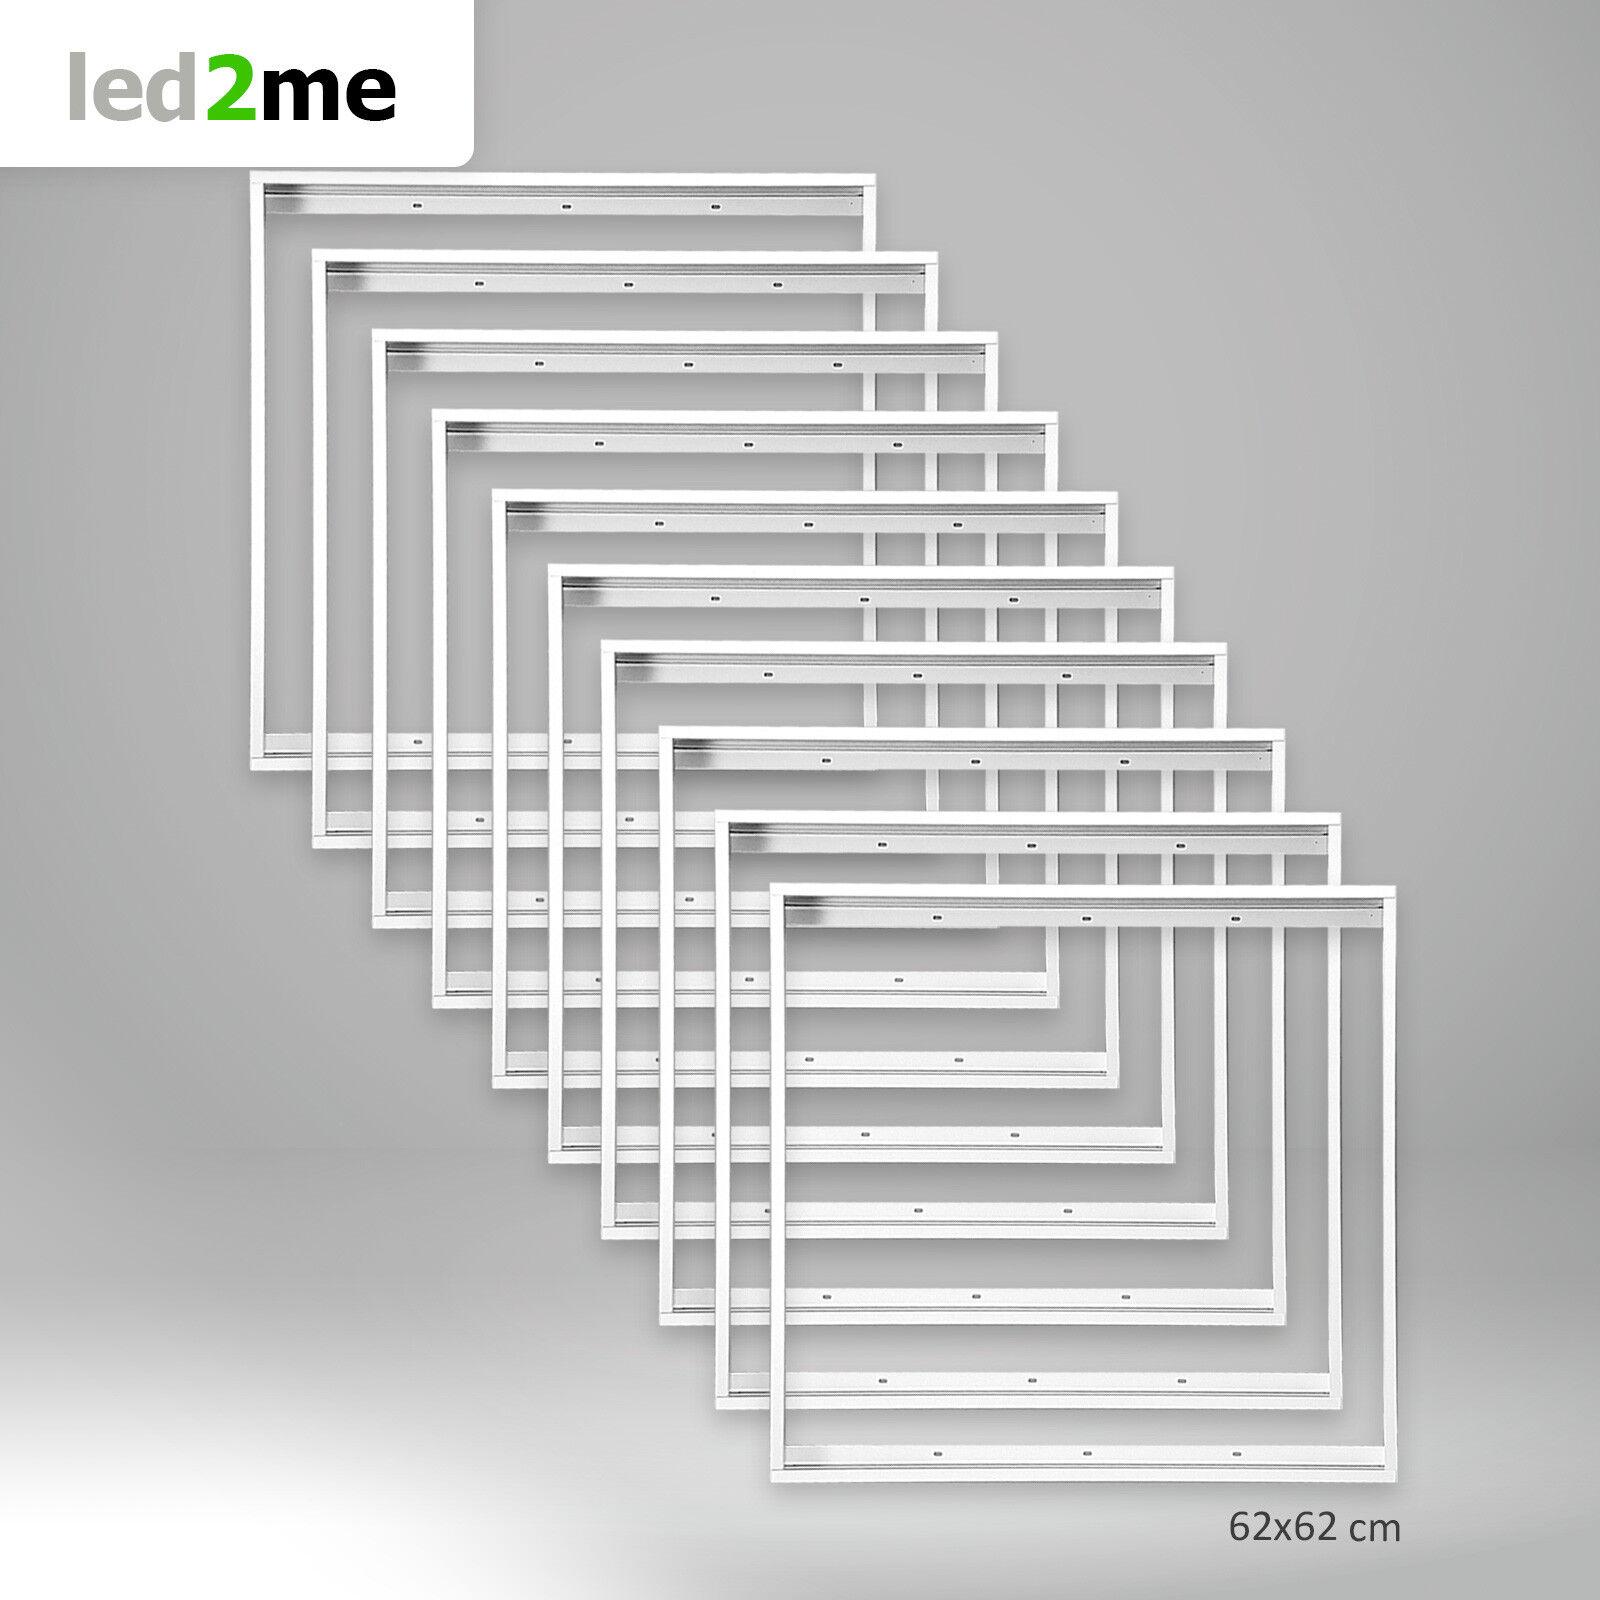 10x Xtend LED Panel Rahmen 62x62cm 620x620mm Farbe Weiß Aufbaurahmen Alu